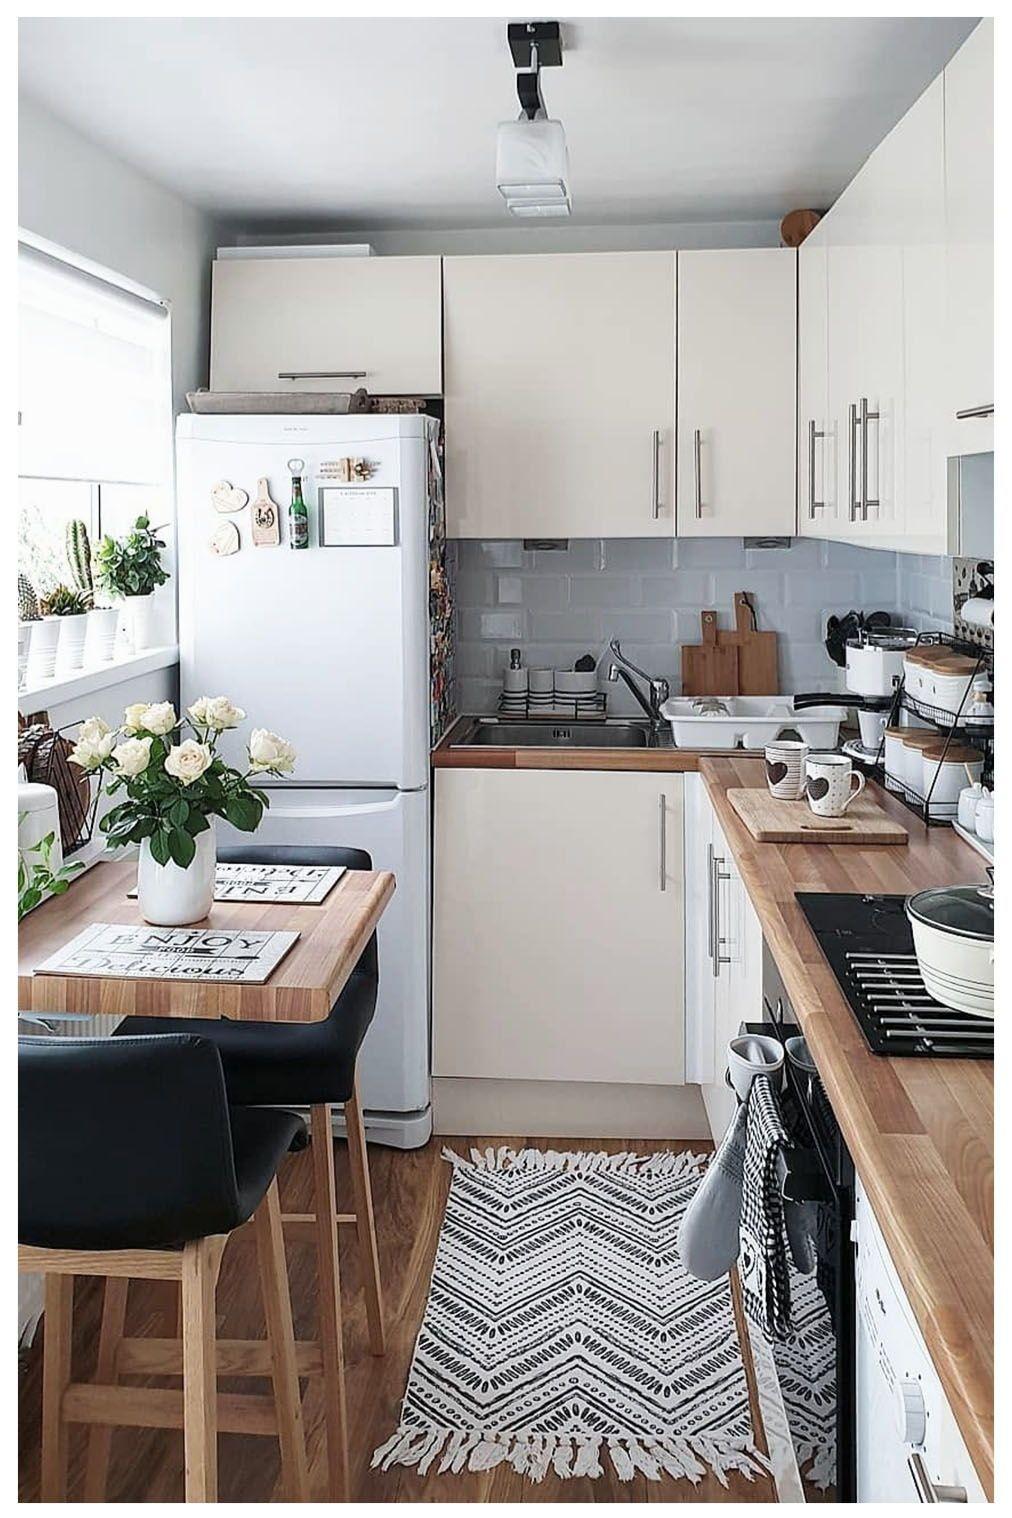 Pin On Kitchen Inspiration Photos